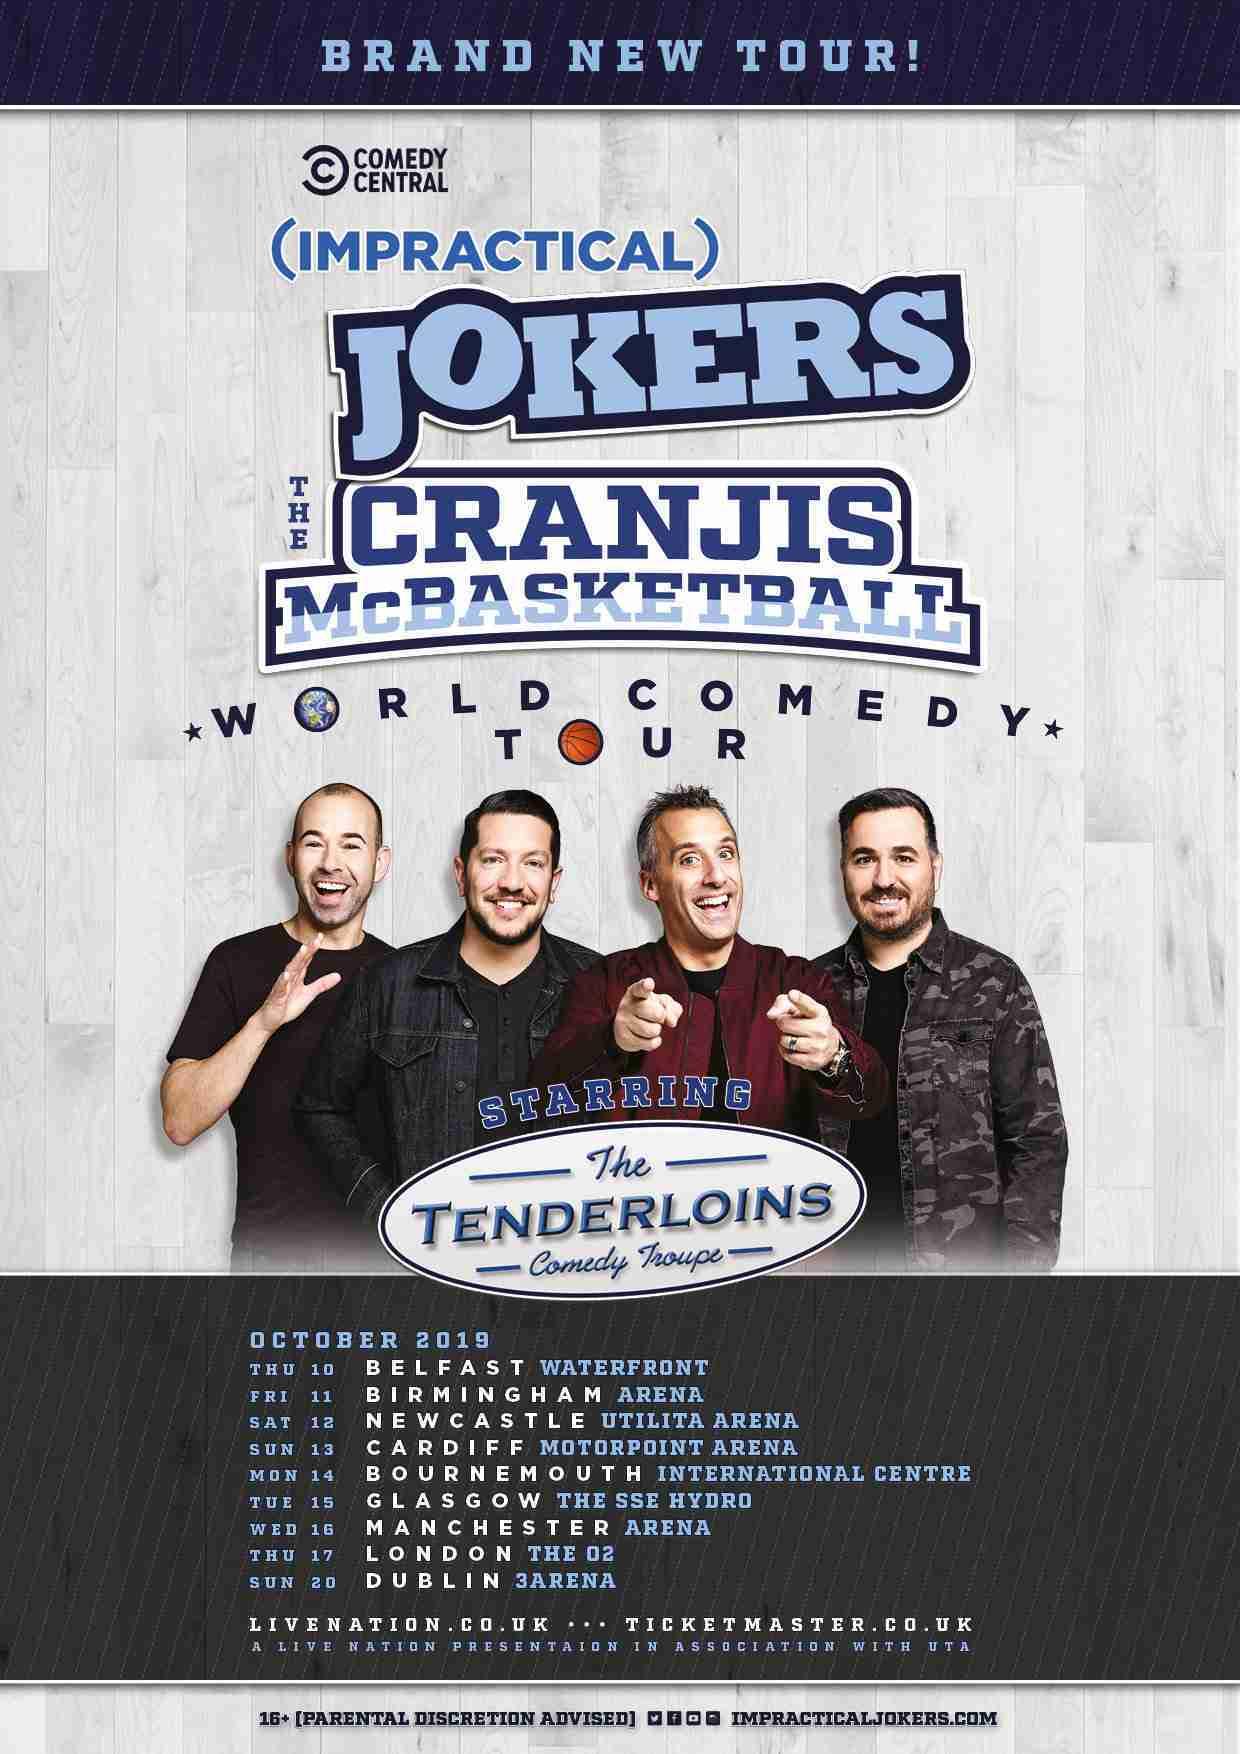 Impractical Jokers Tour 2020.The Arts Shelf Impractical Jokers Announce The Cranjis